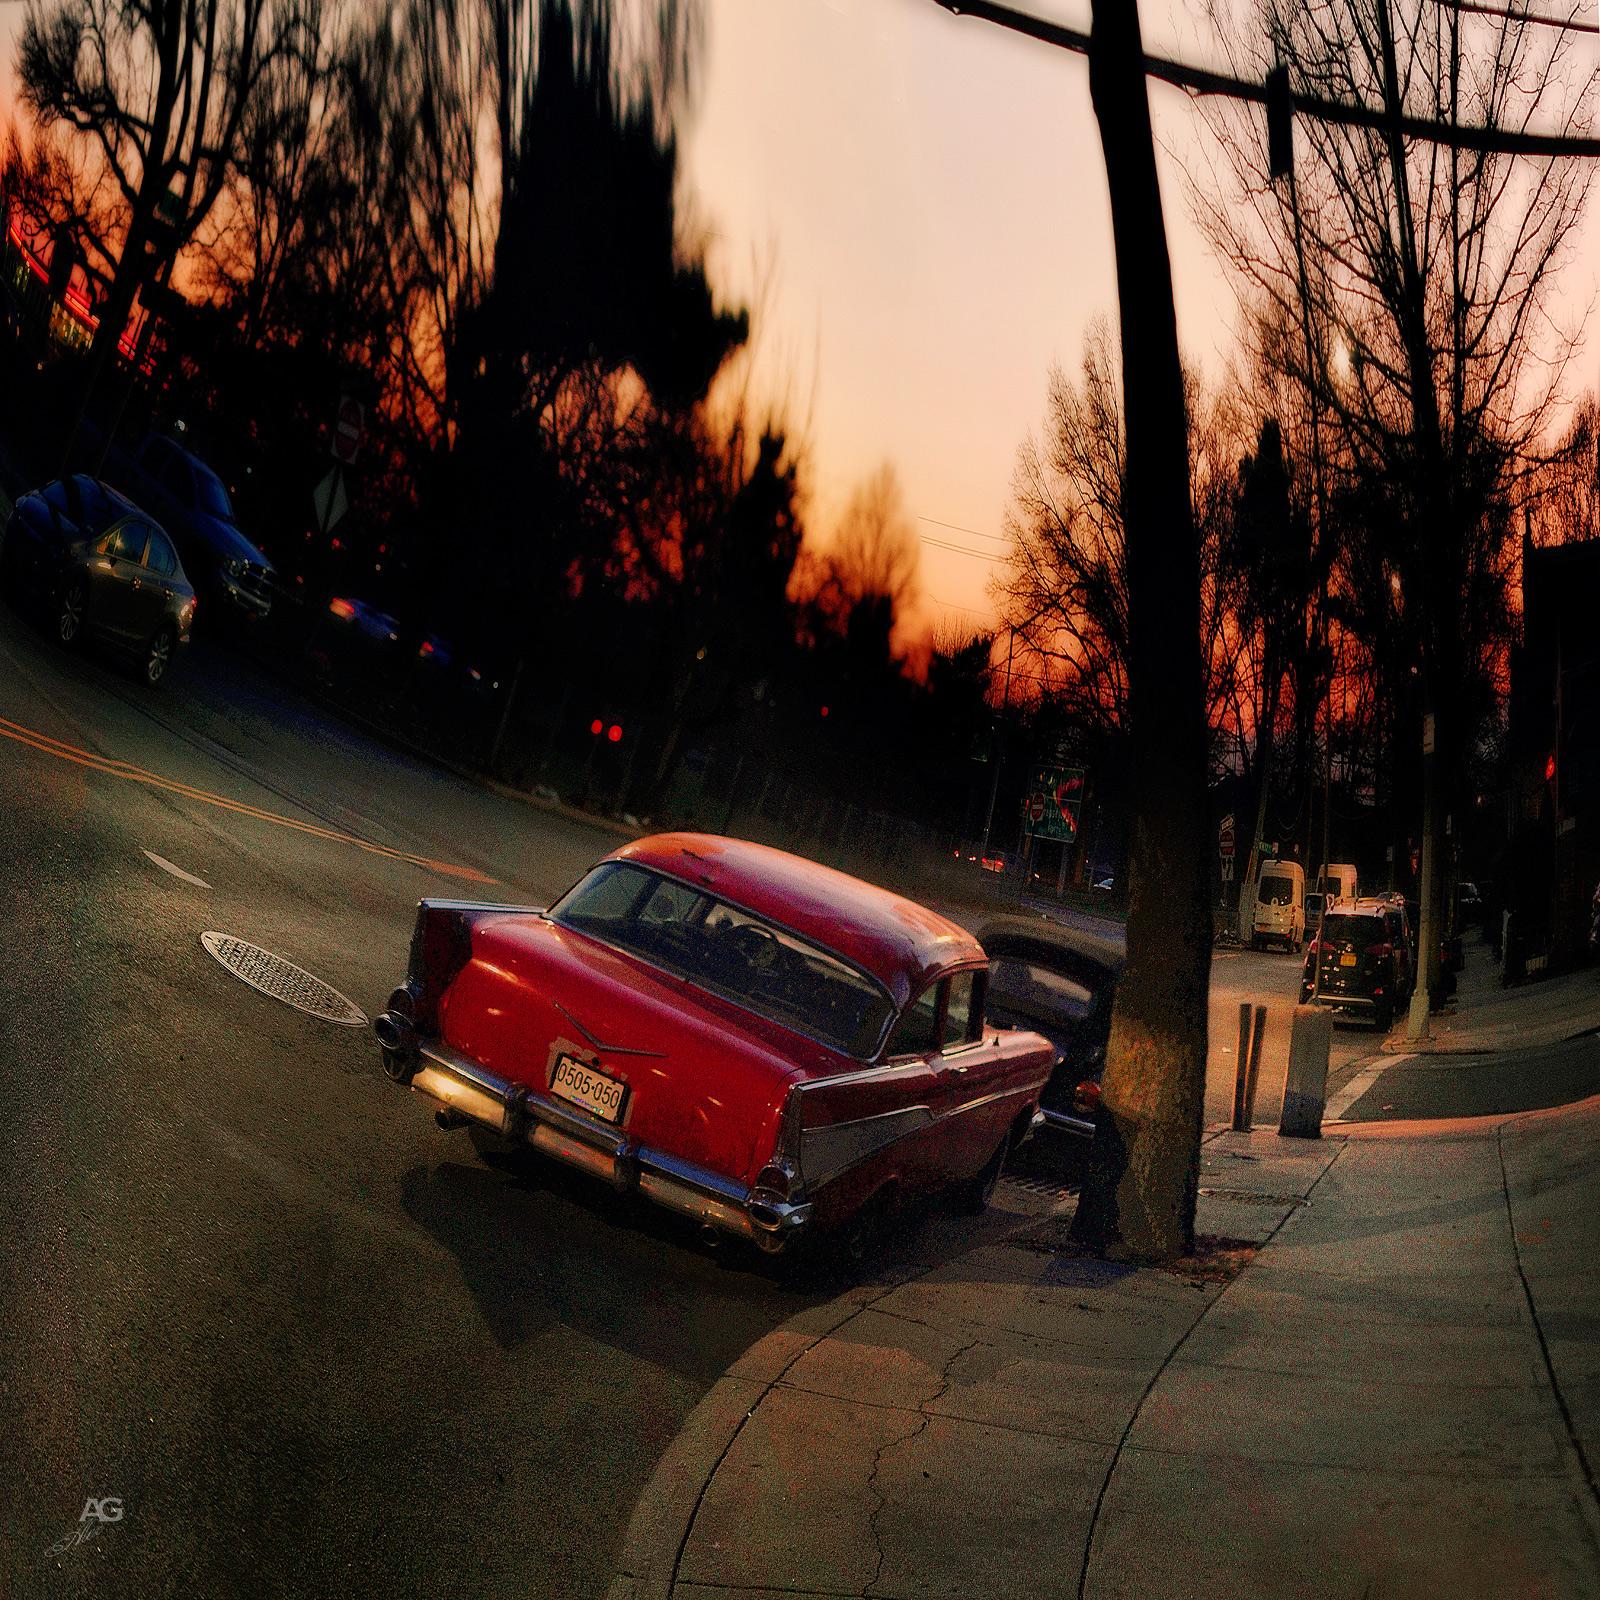 VintageChevroletOnASUnsetBrooklynStreet_warped_1600